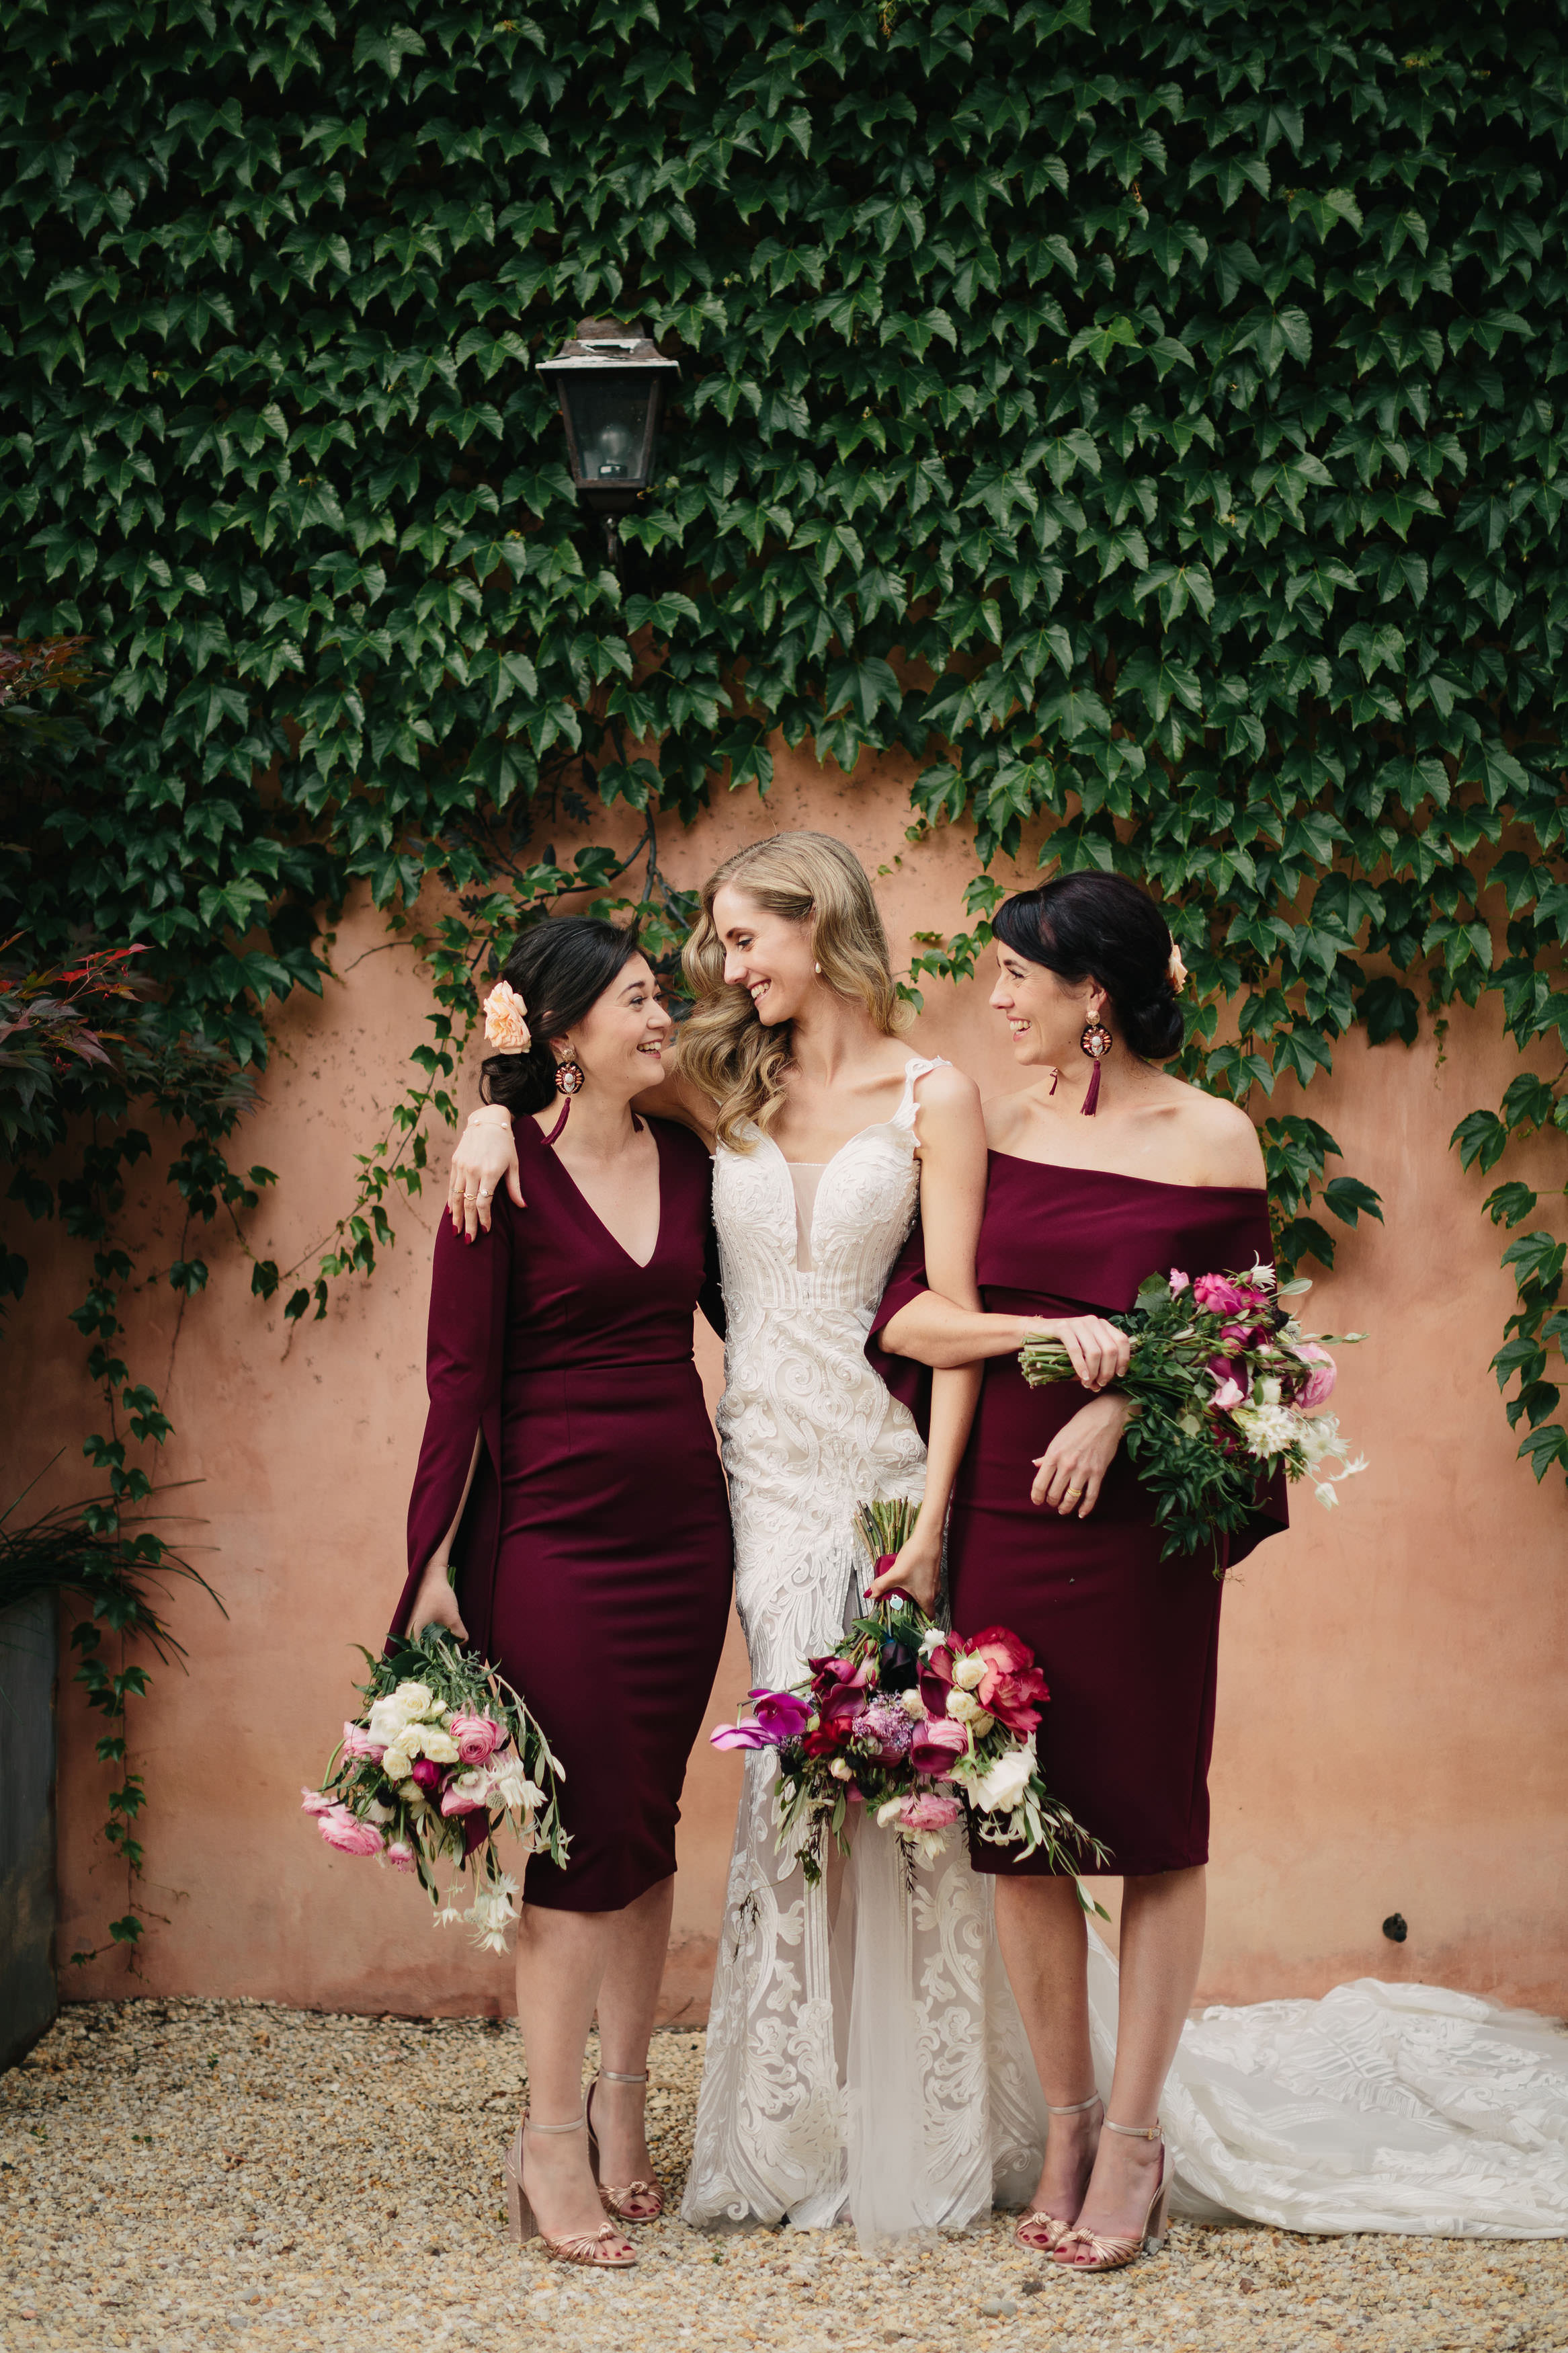 067_hunter_valley_wedding_photography_redleaf_paul_bamford_finchandoak.jpg